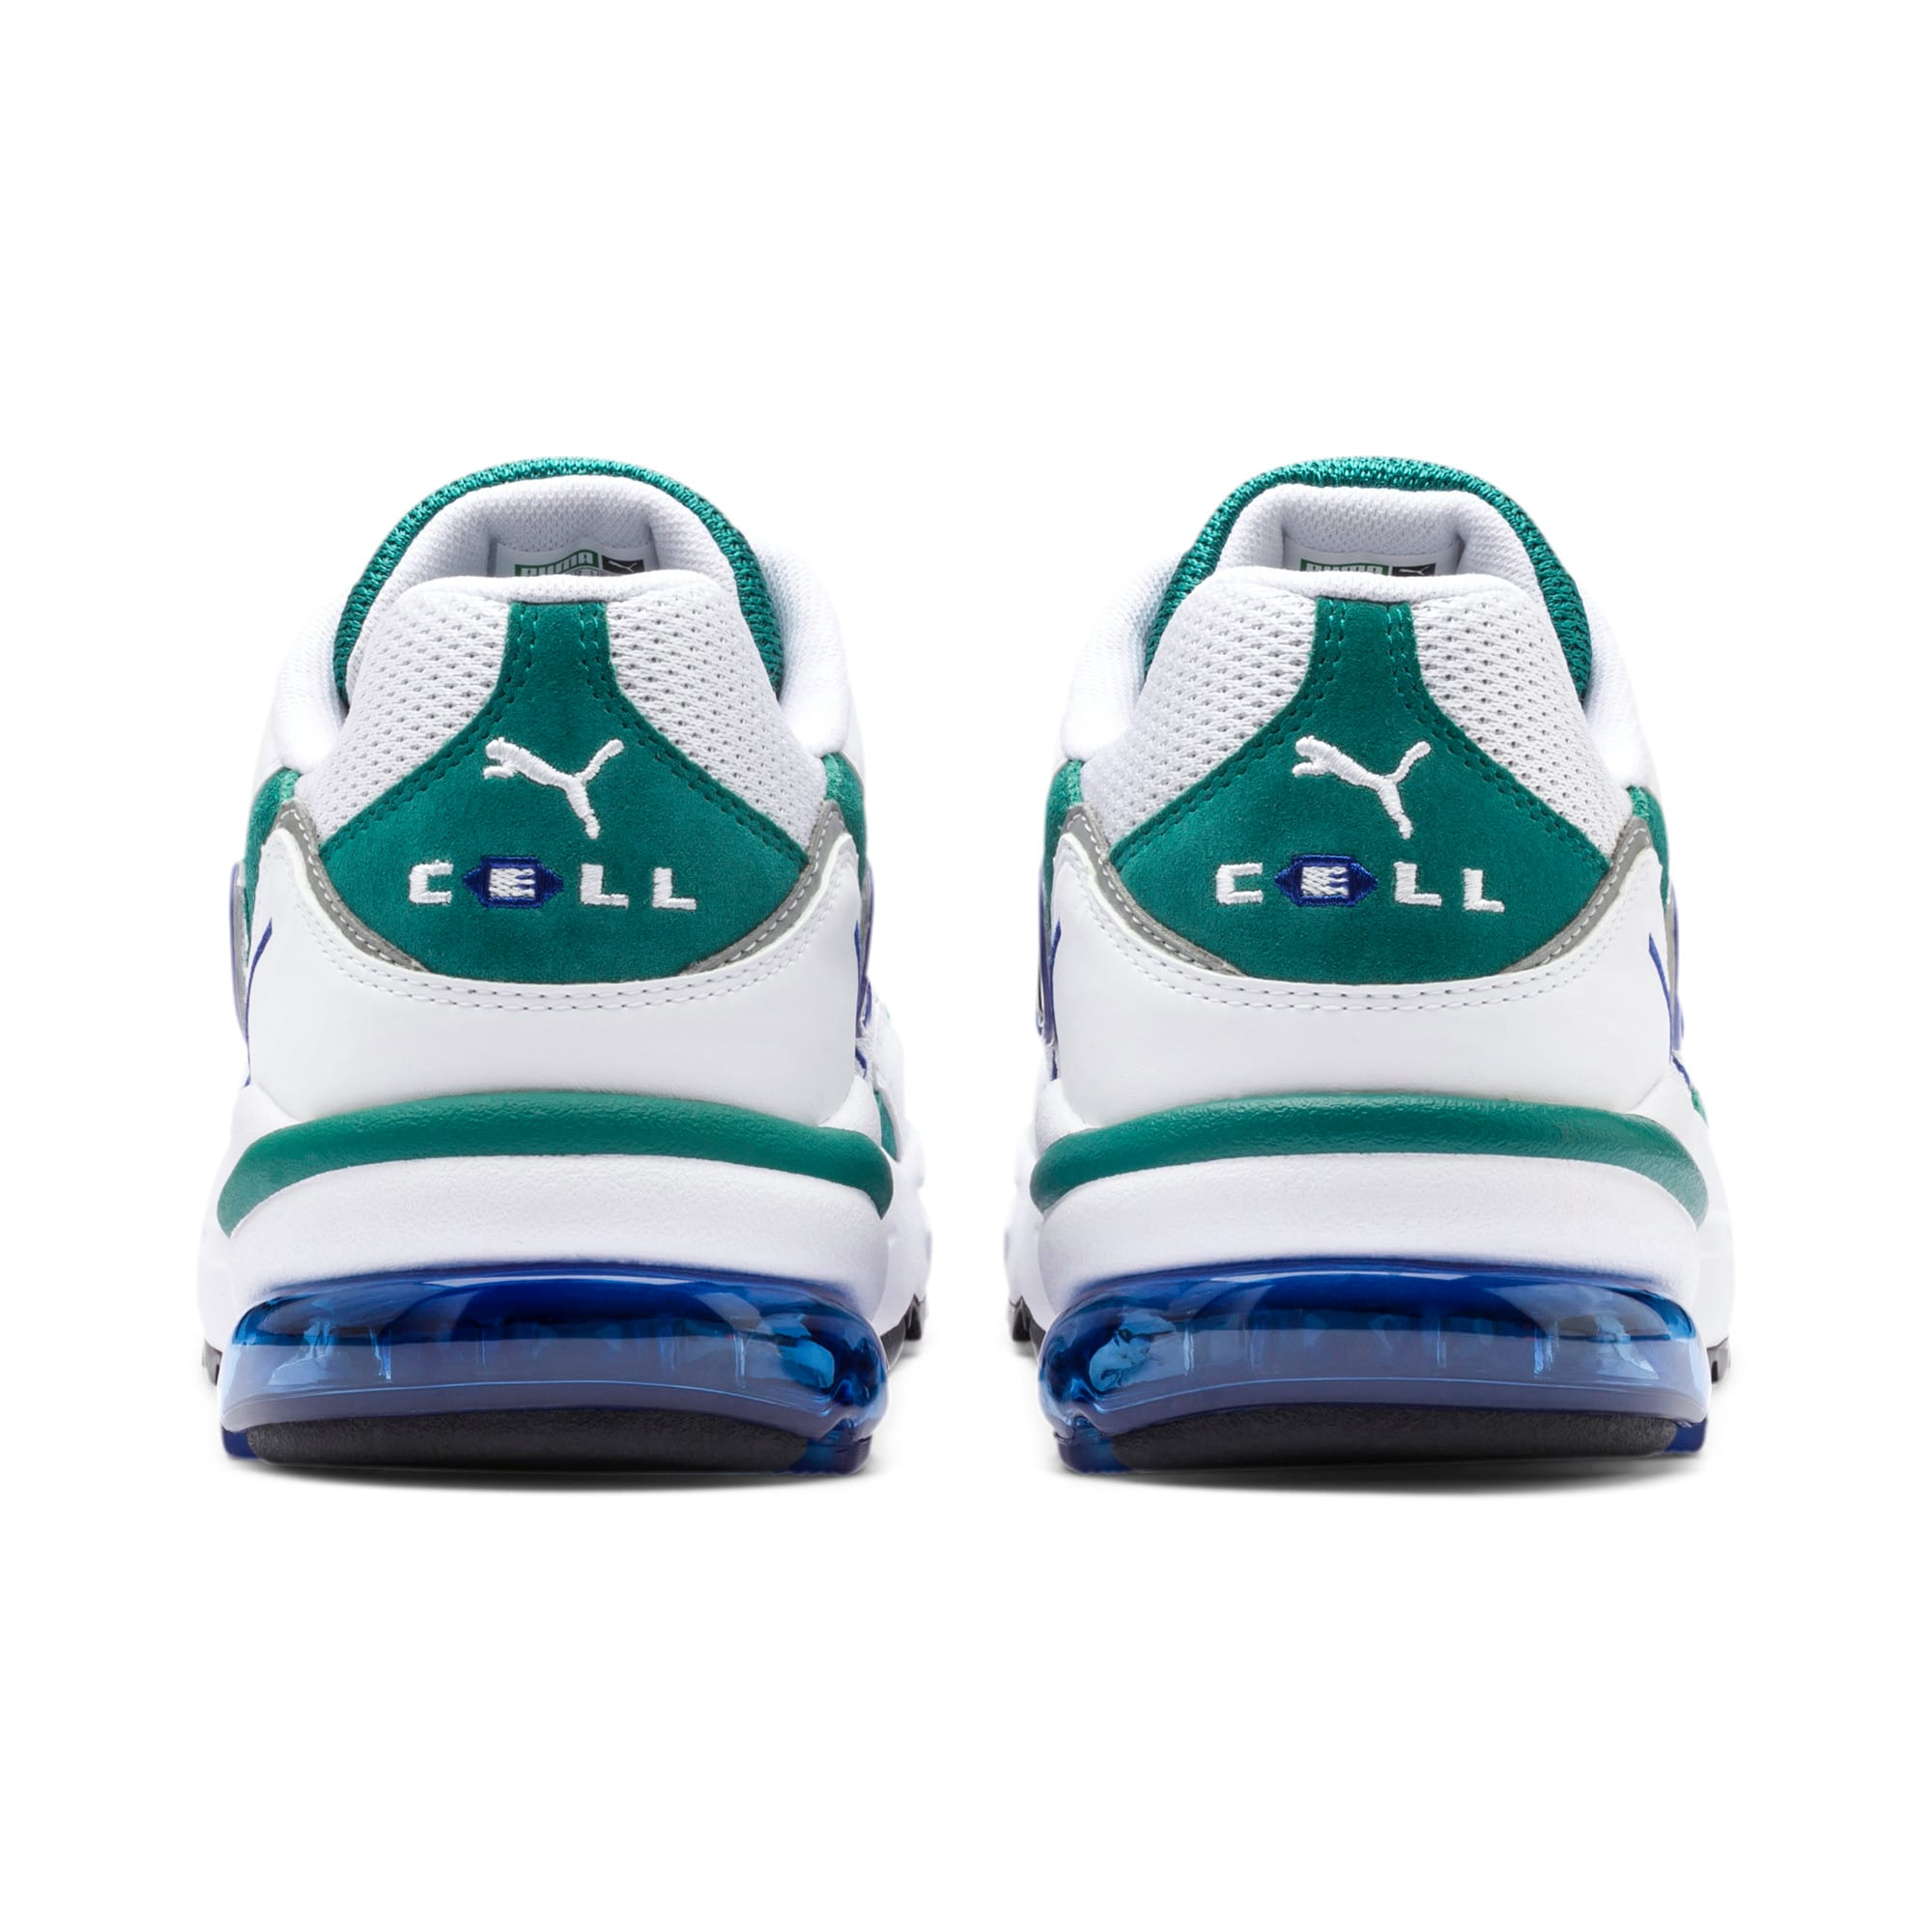 Thumbnail 4 of CELL Ultra OG Pack Sneakers, Puma White-Teal Green, medium